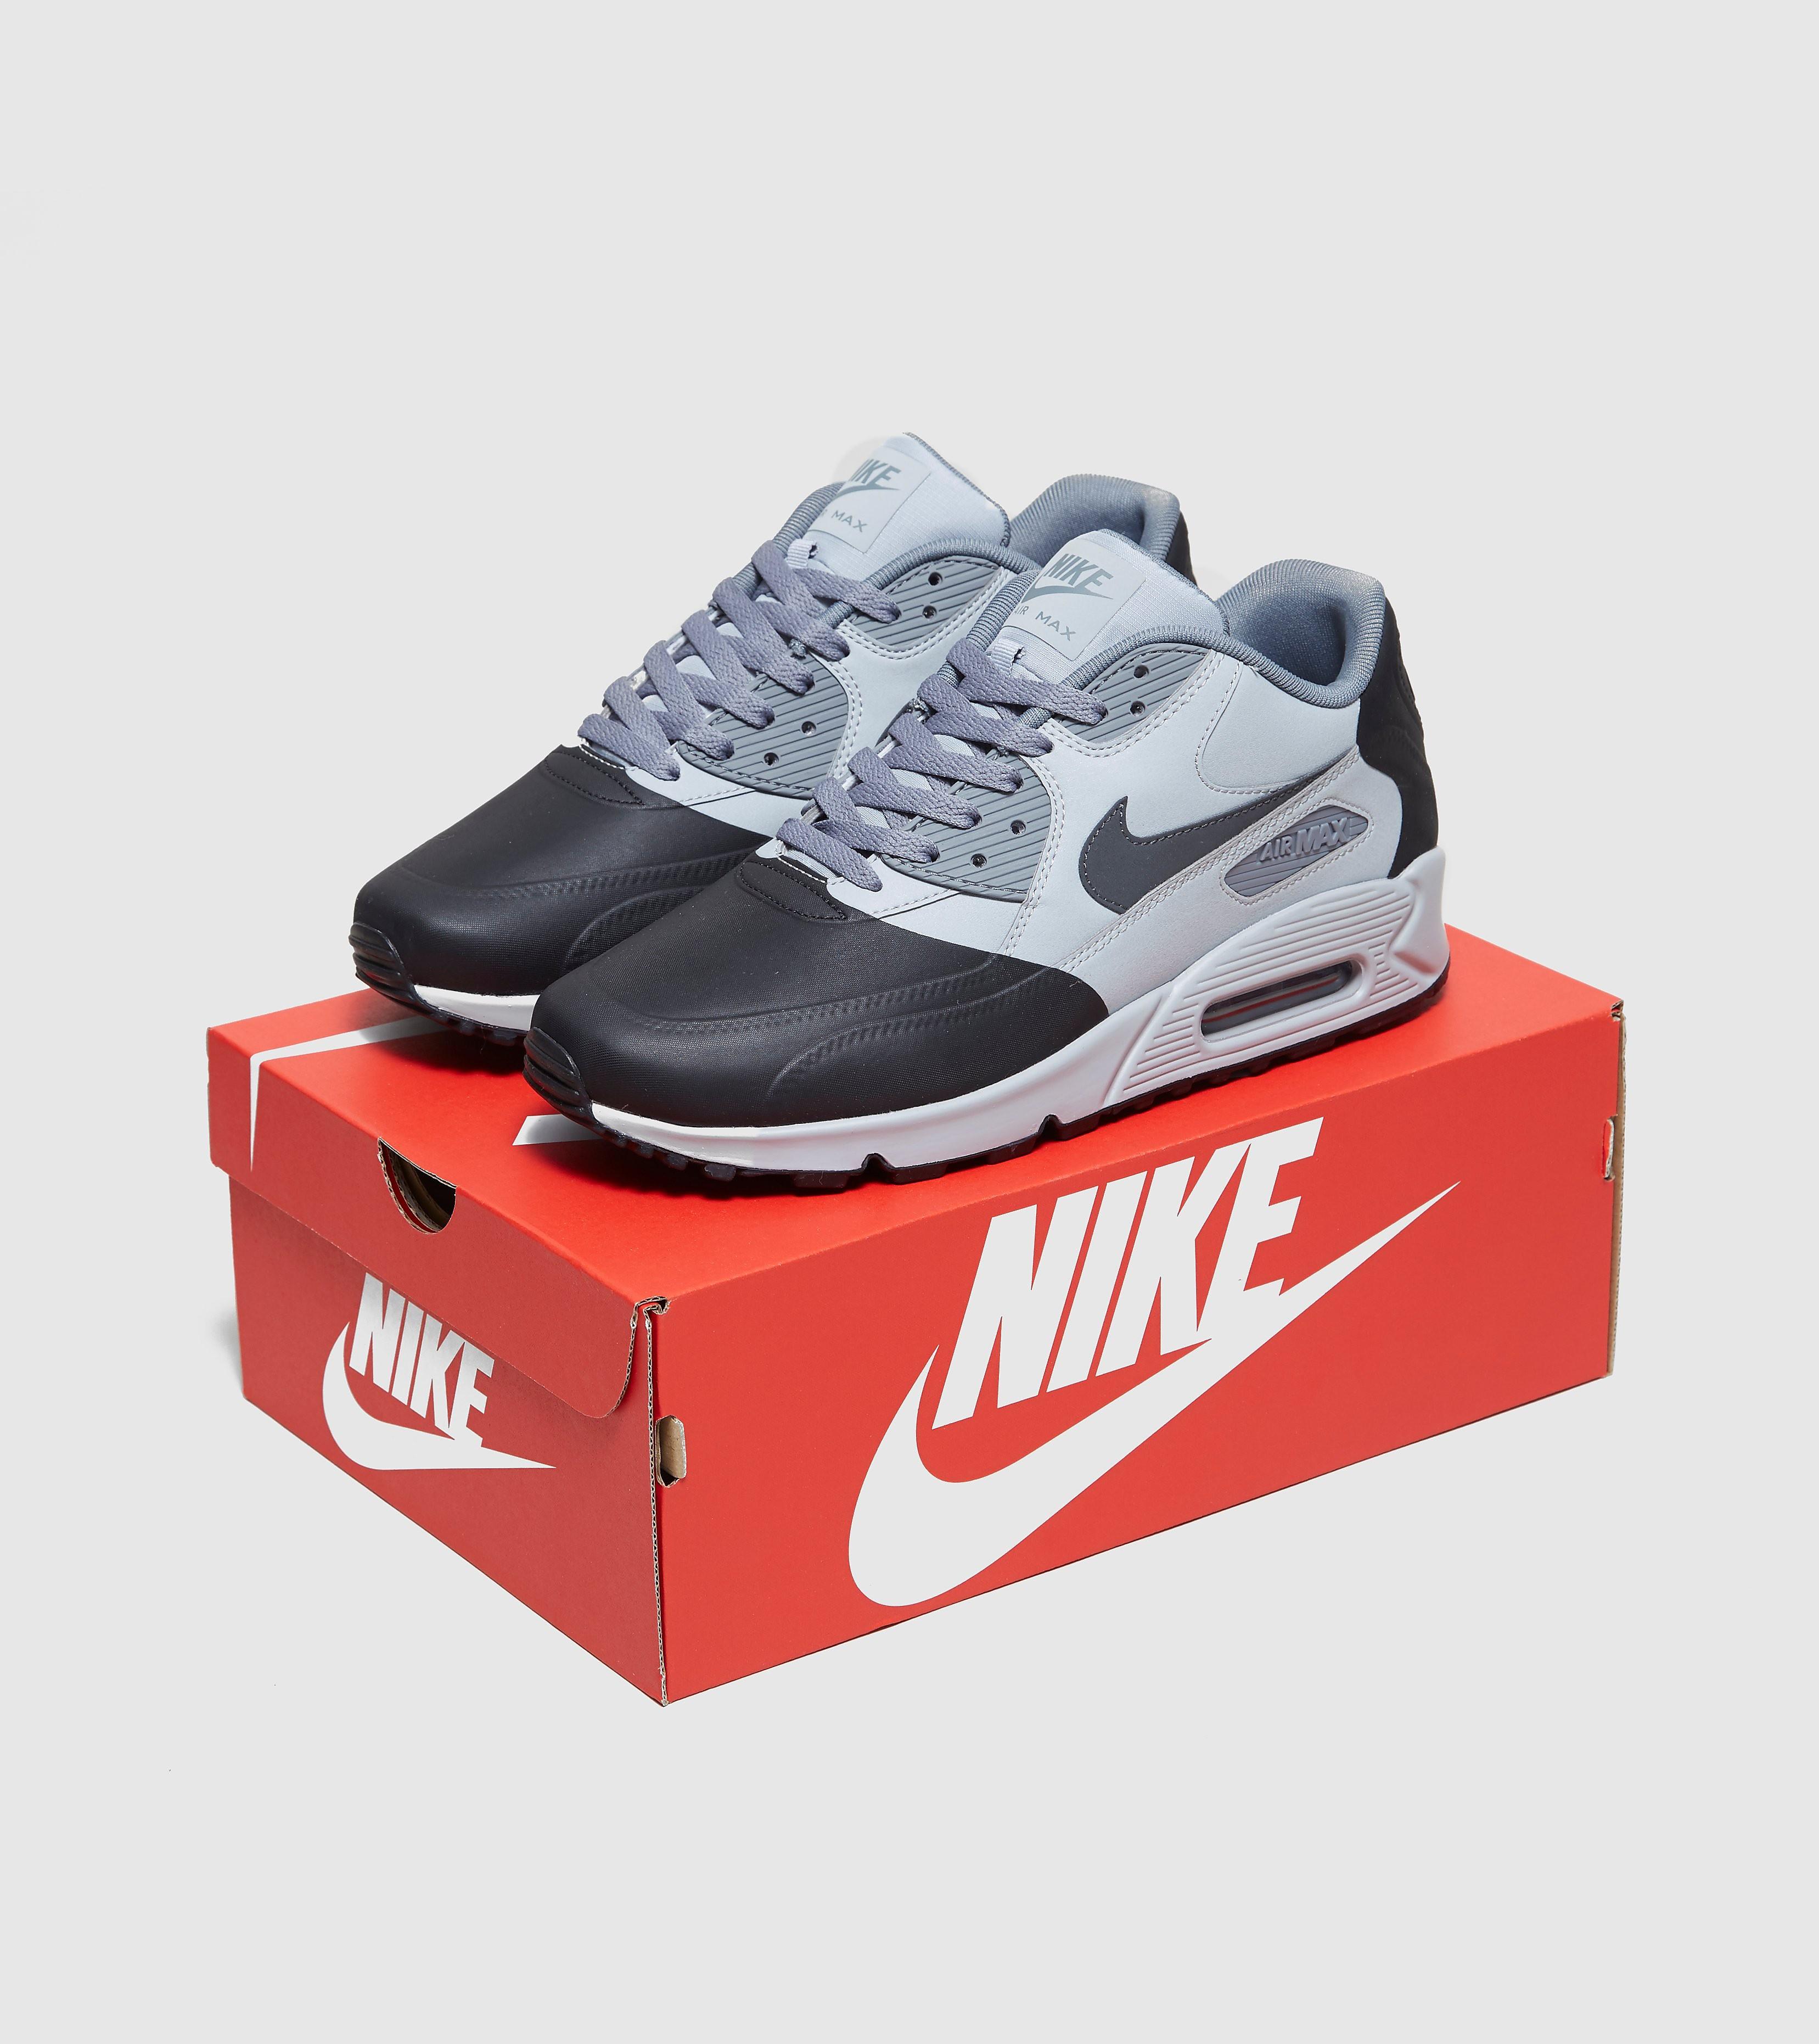 Nike Air Max 90 'Wolf Grey'